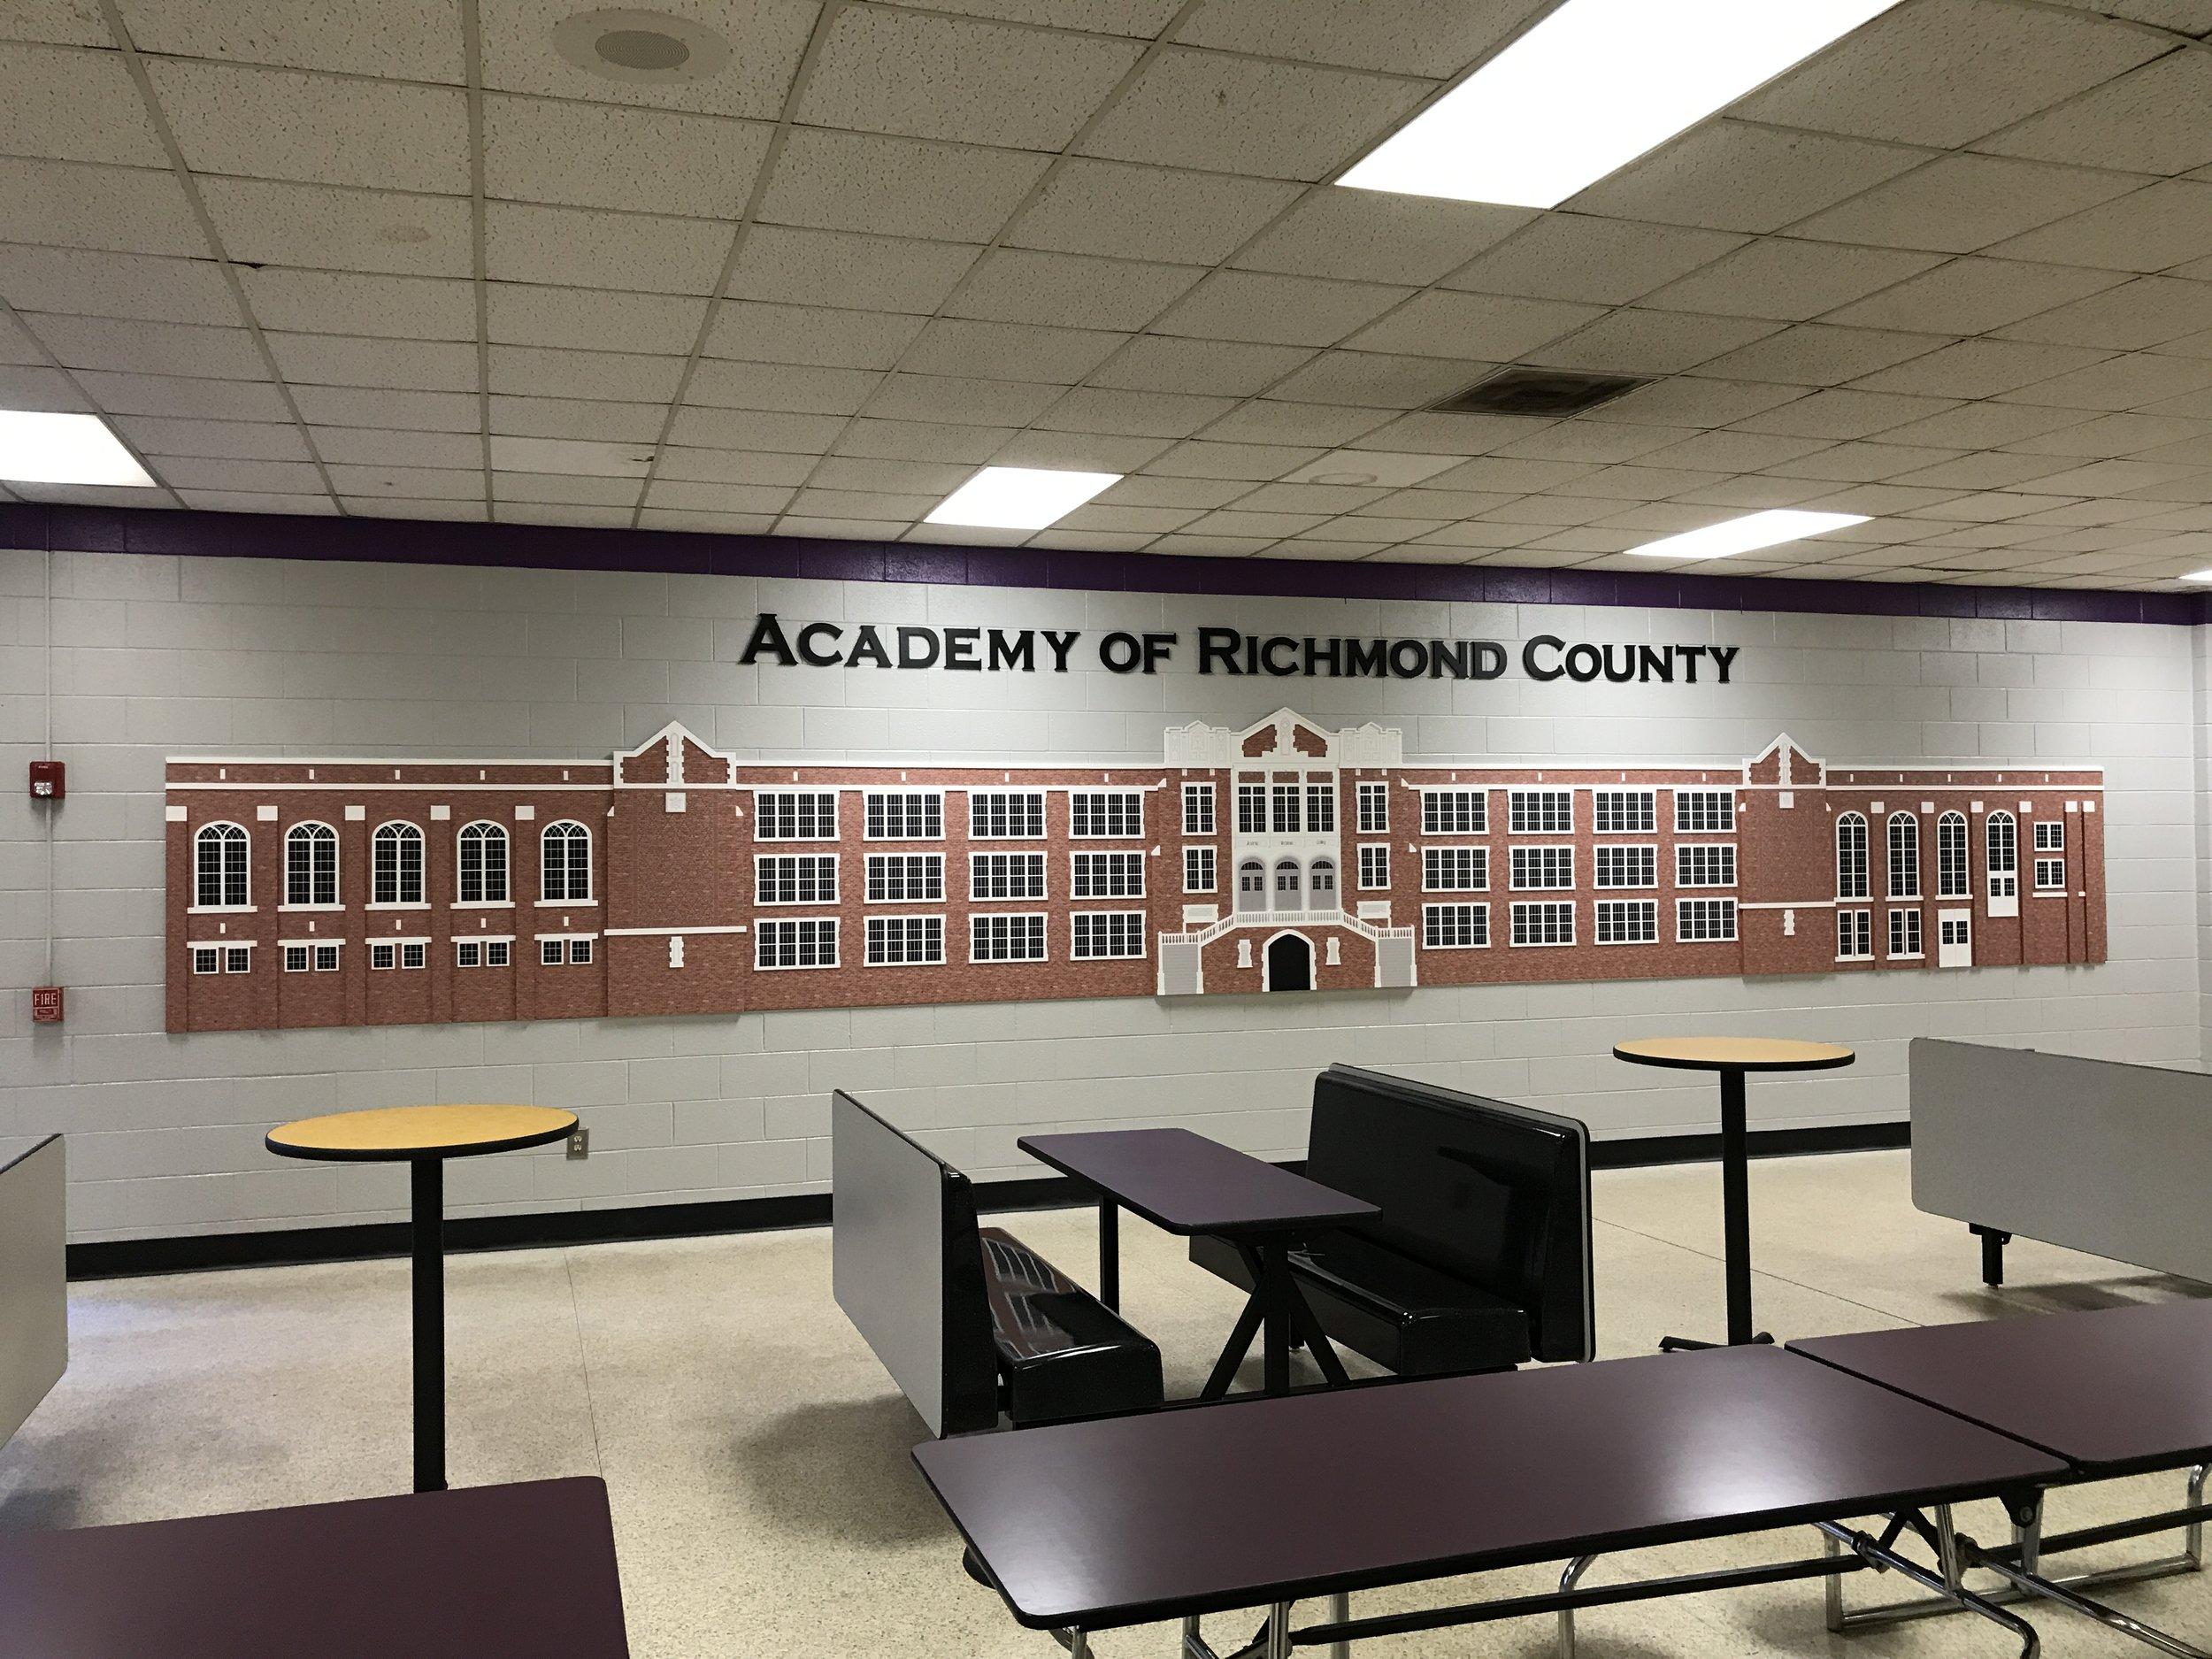 Academy Richmond County